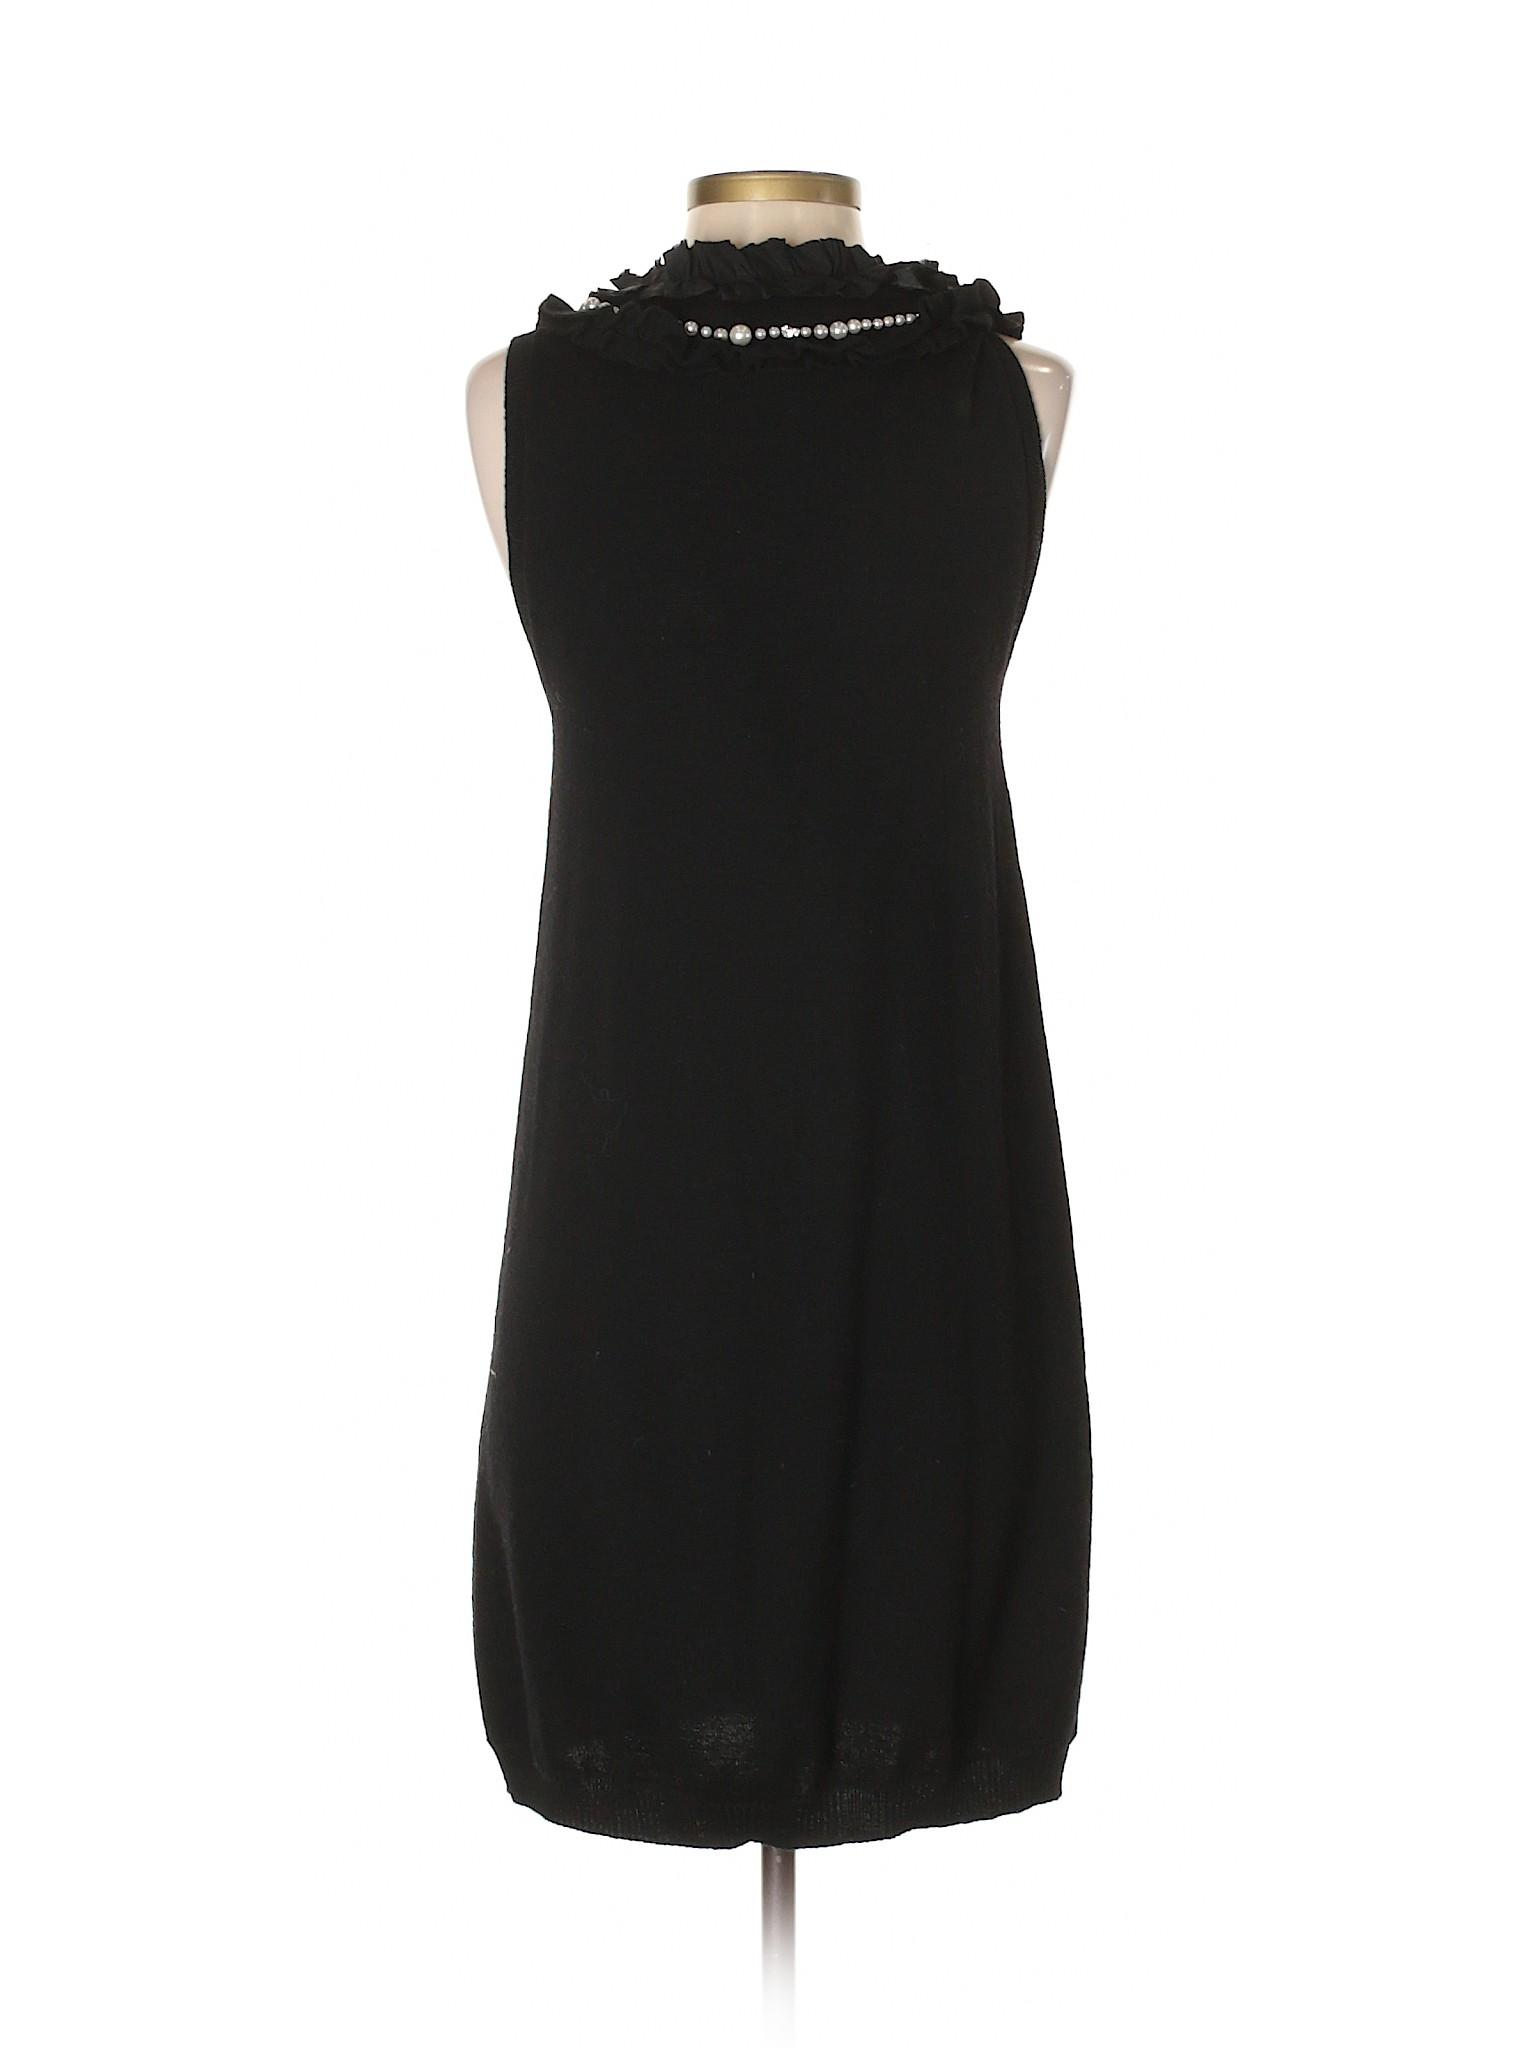 Nanette Dress Casual Selling Lepore Selling Lepore Casual Nanette dxIwtq0TaT